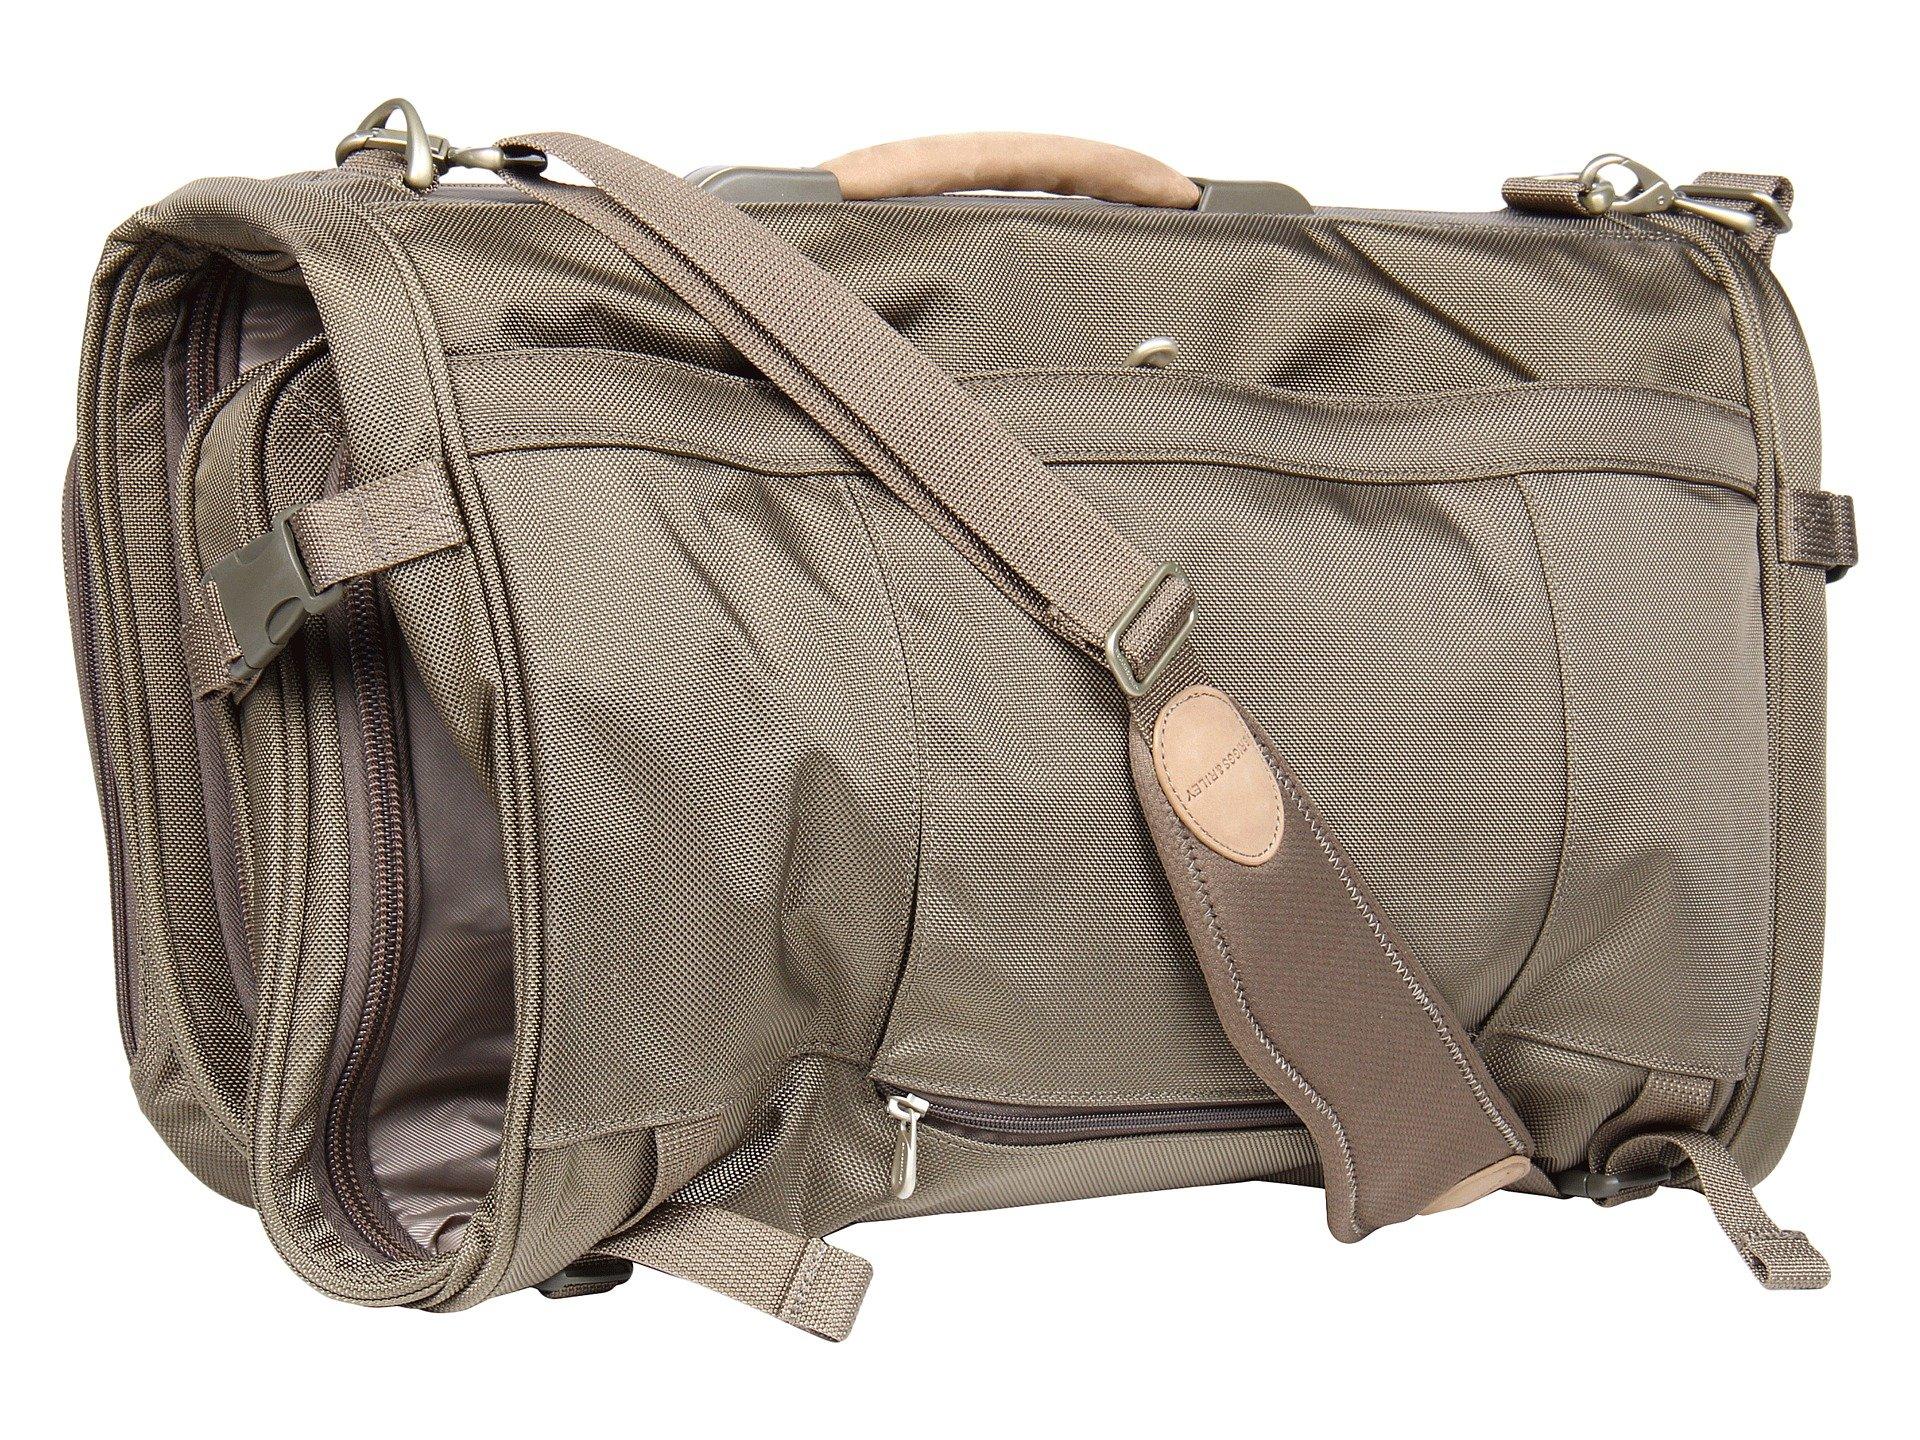 Compact Bag Garment Olive Baseline Briggs amp; Riley tXwSqq14